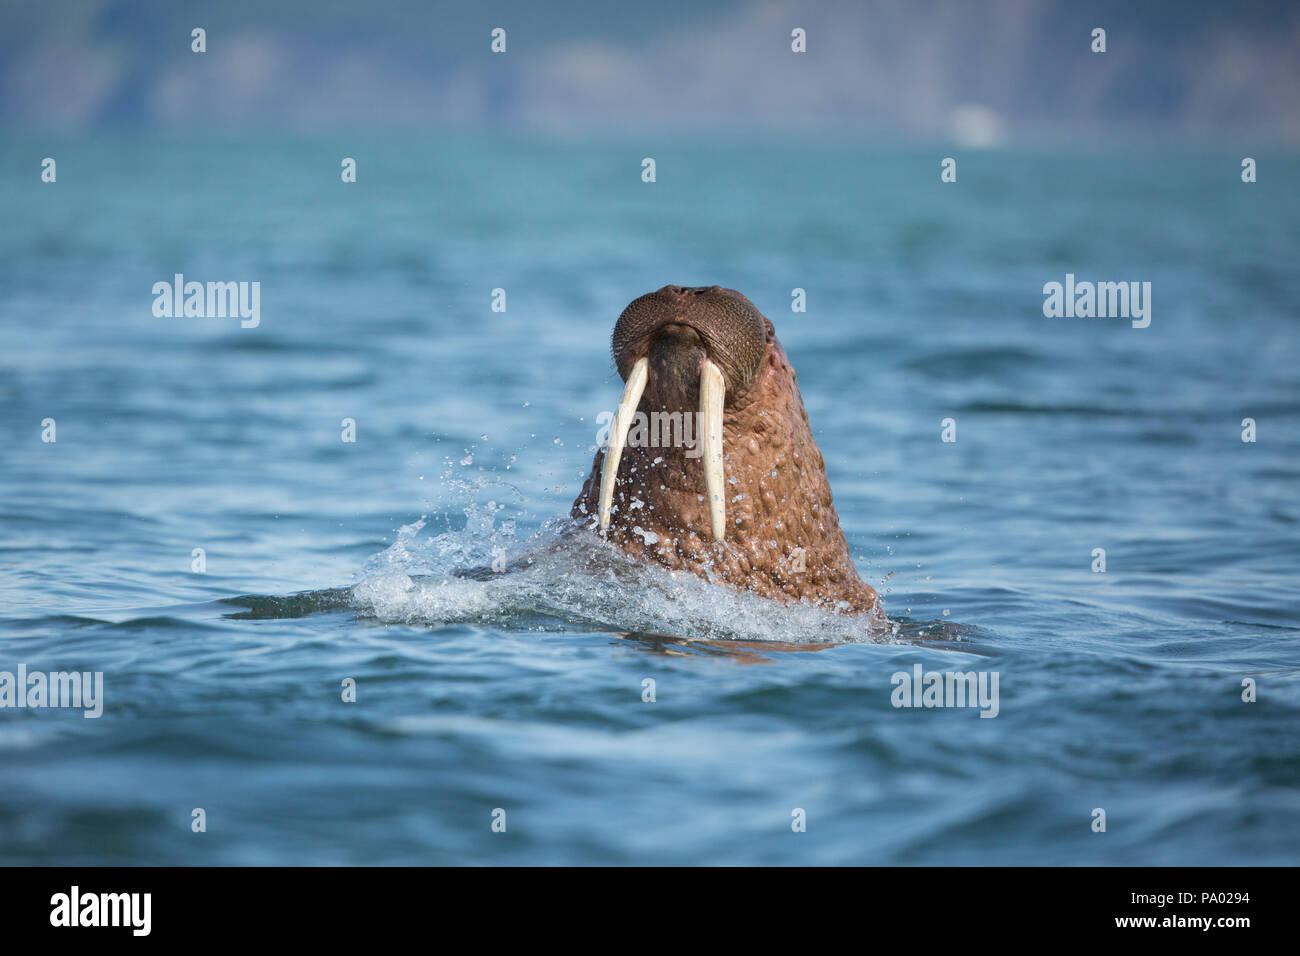 La morsa del Pacífico (Odobenus rosmarus divergens), Kamchatka, Rusia Foto de stock